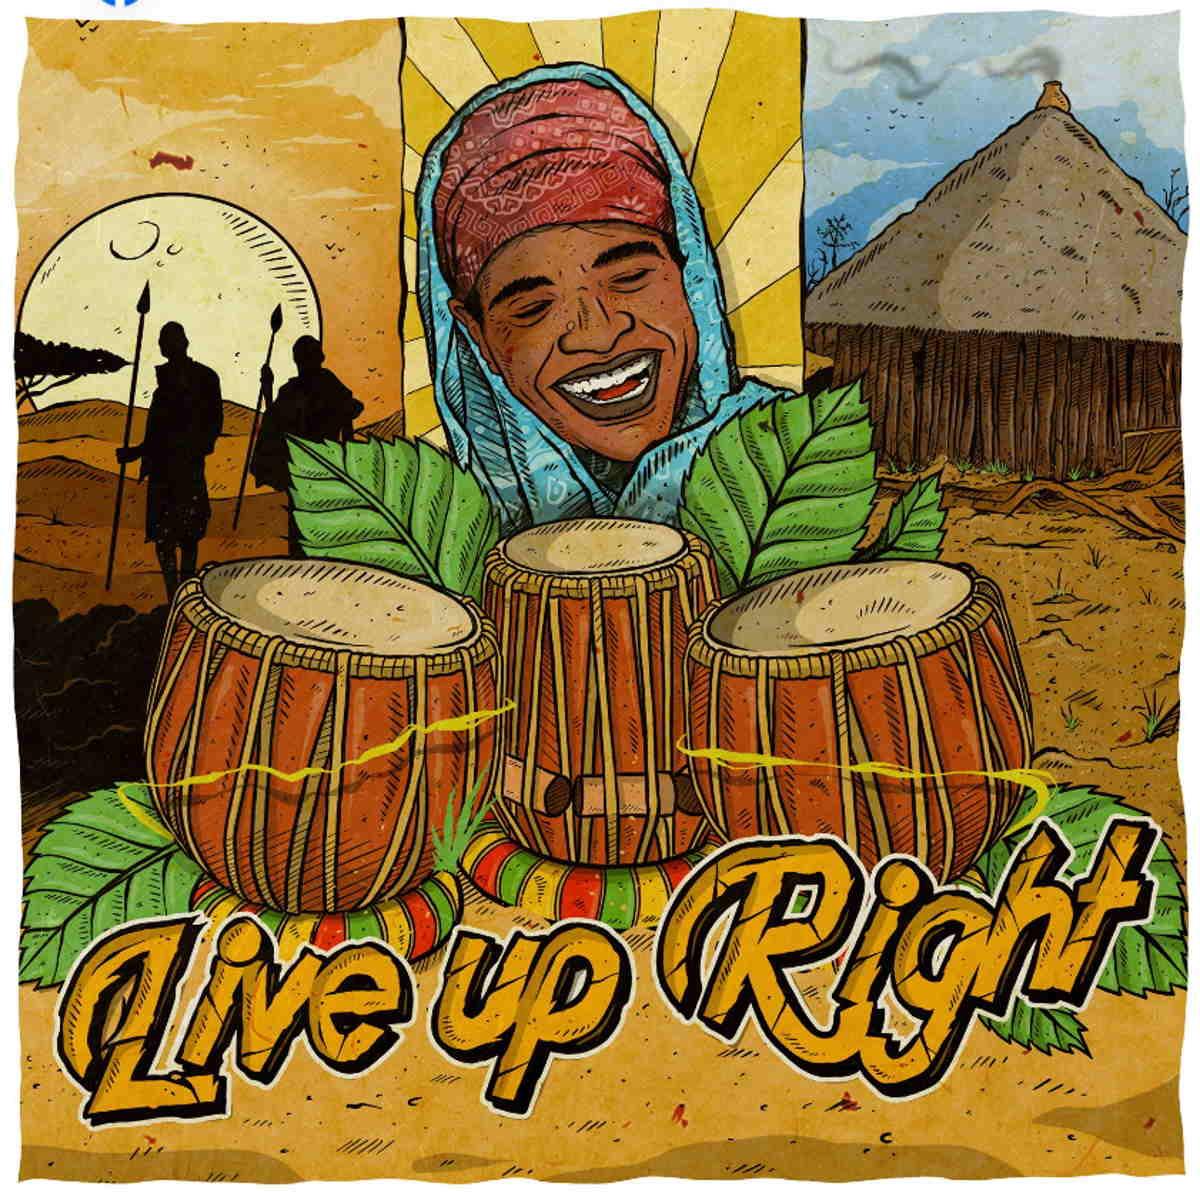 Live Up Right – Ishmel Mcanuff